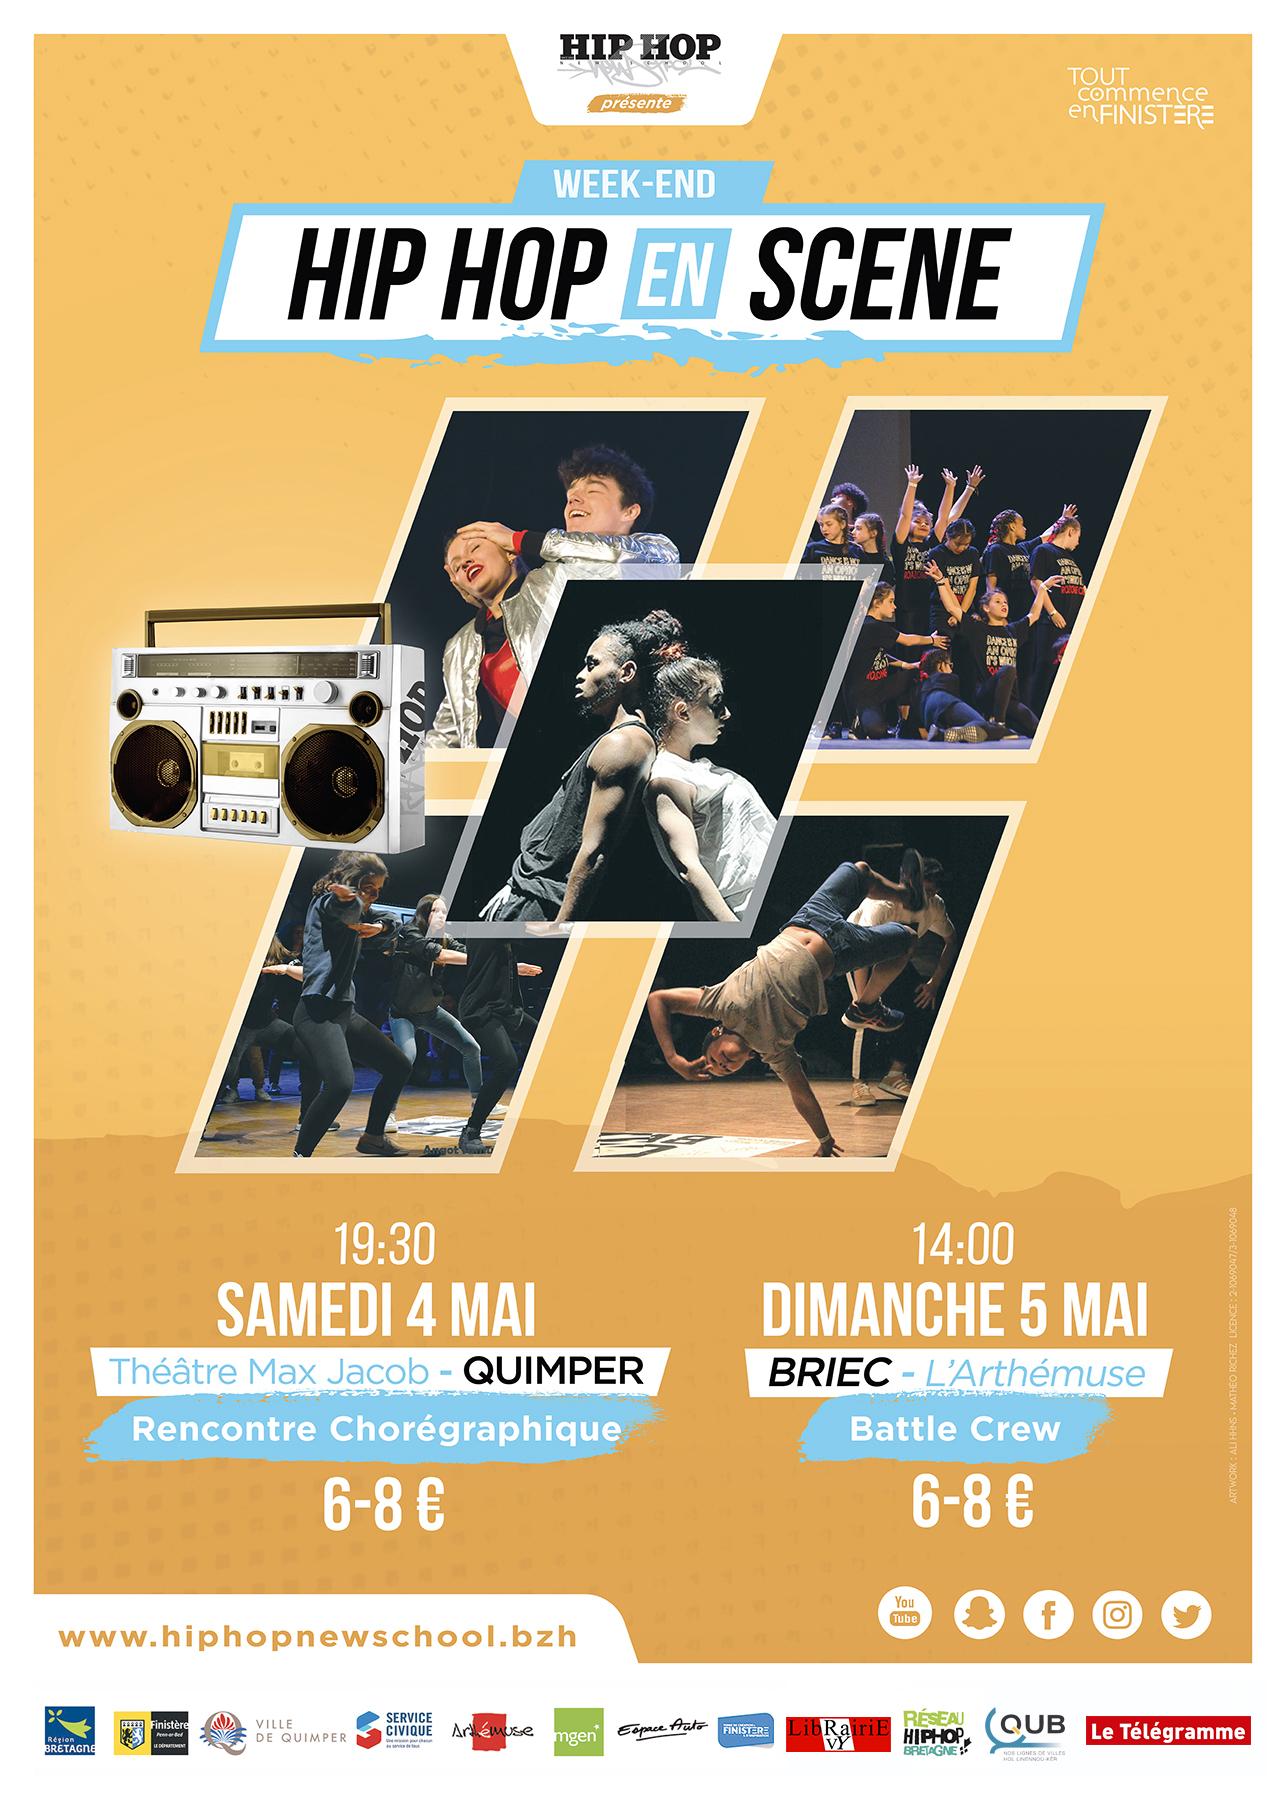 site de rencontres hip hop